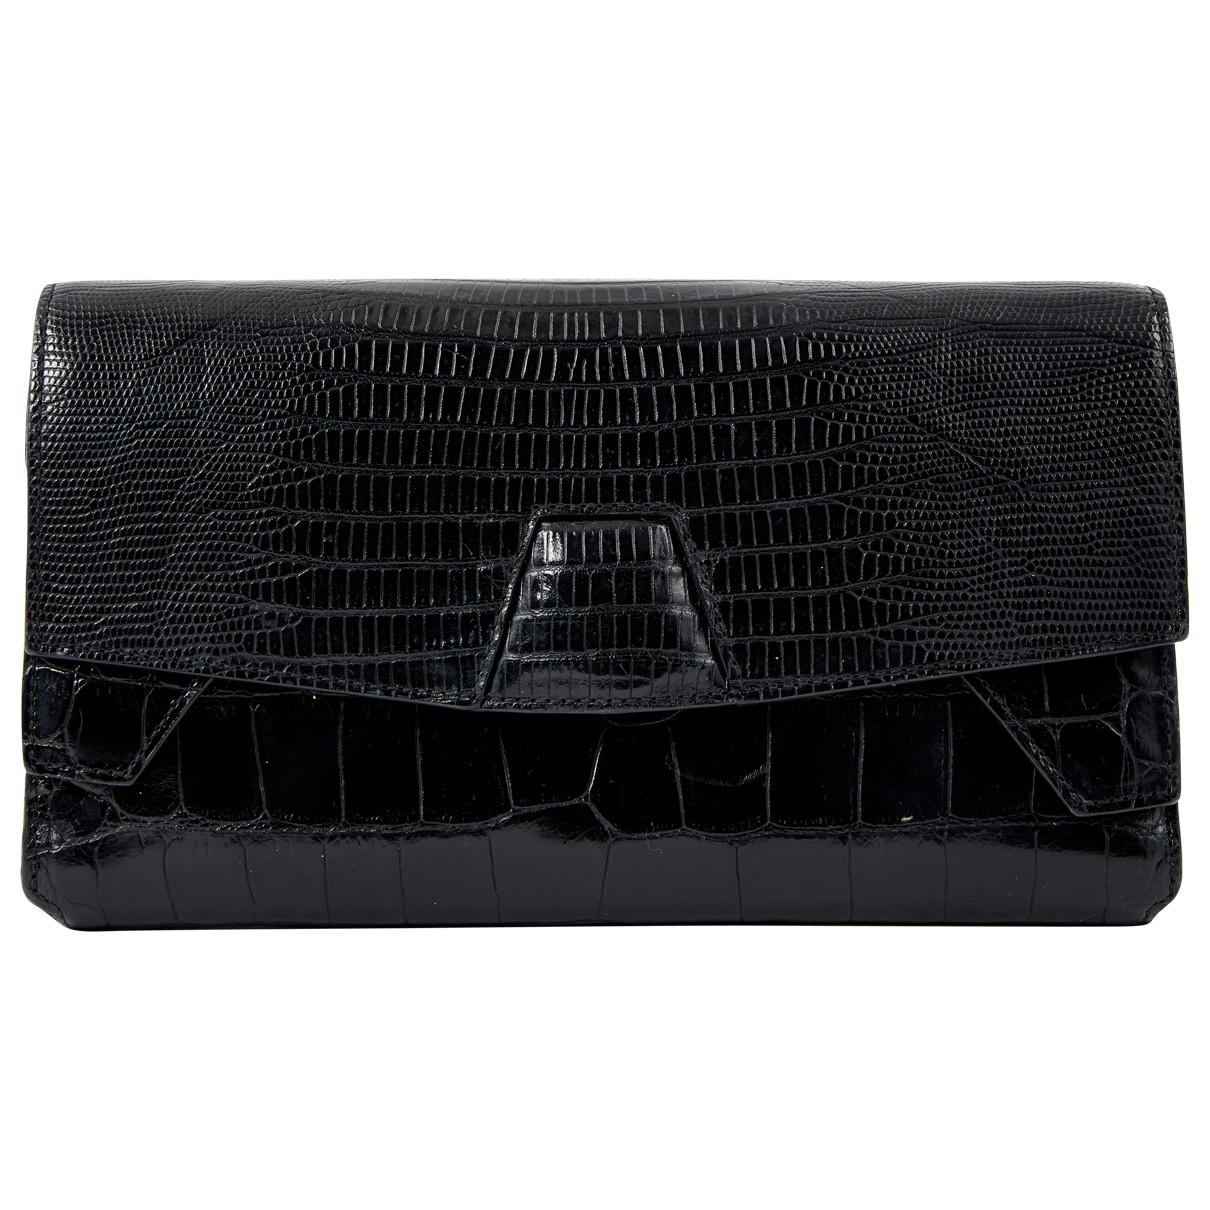 Pre-owned - Leather clutch bag Alexander Wang Uxa1tu0IyQ